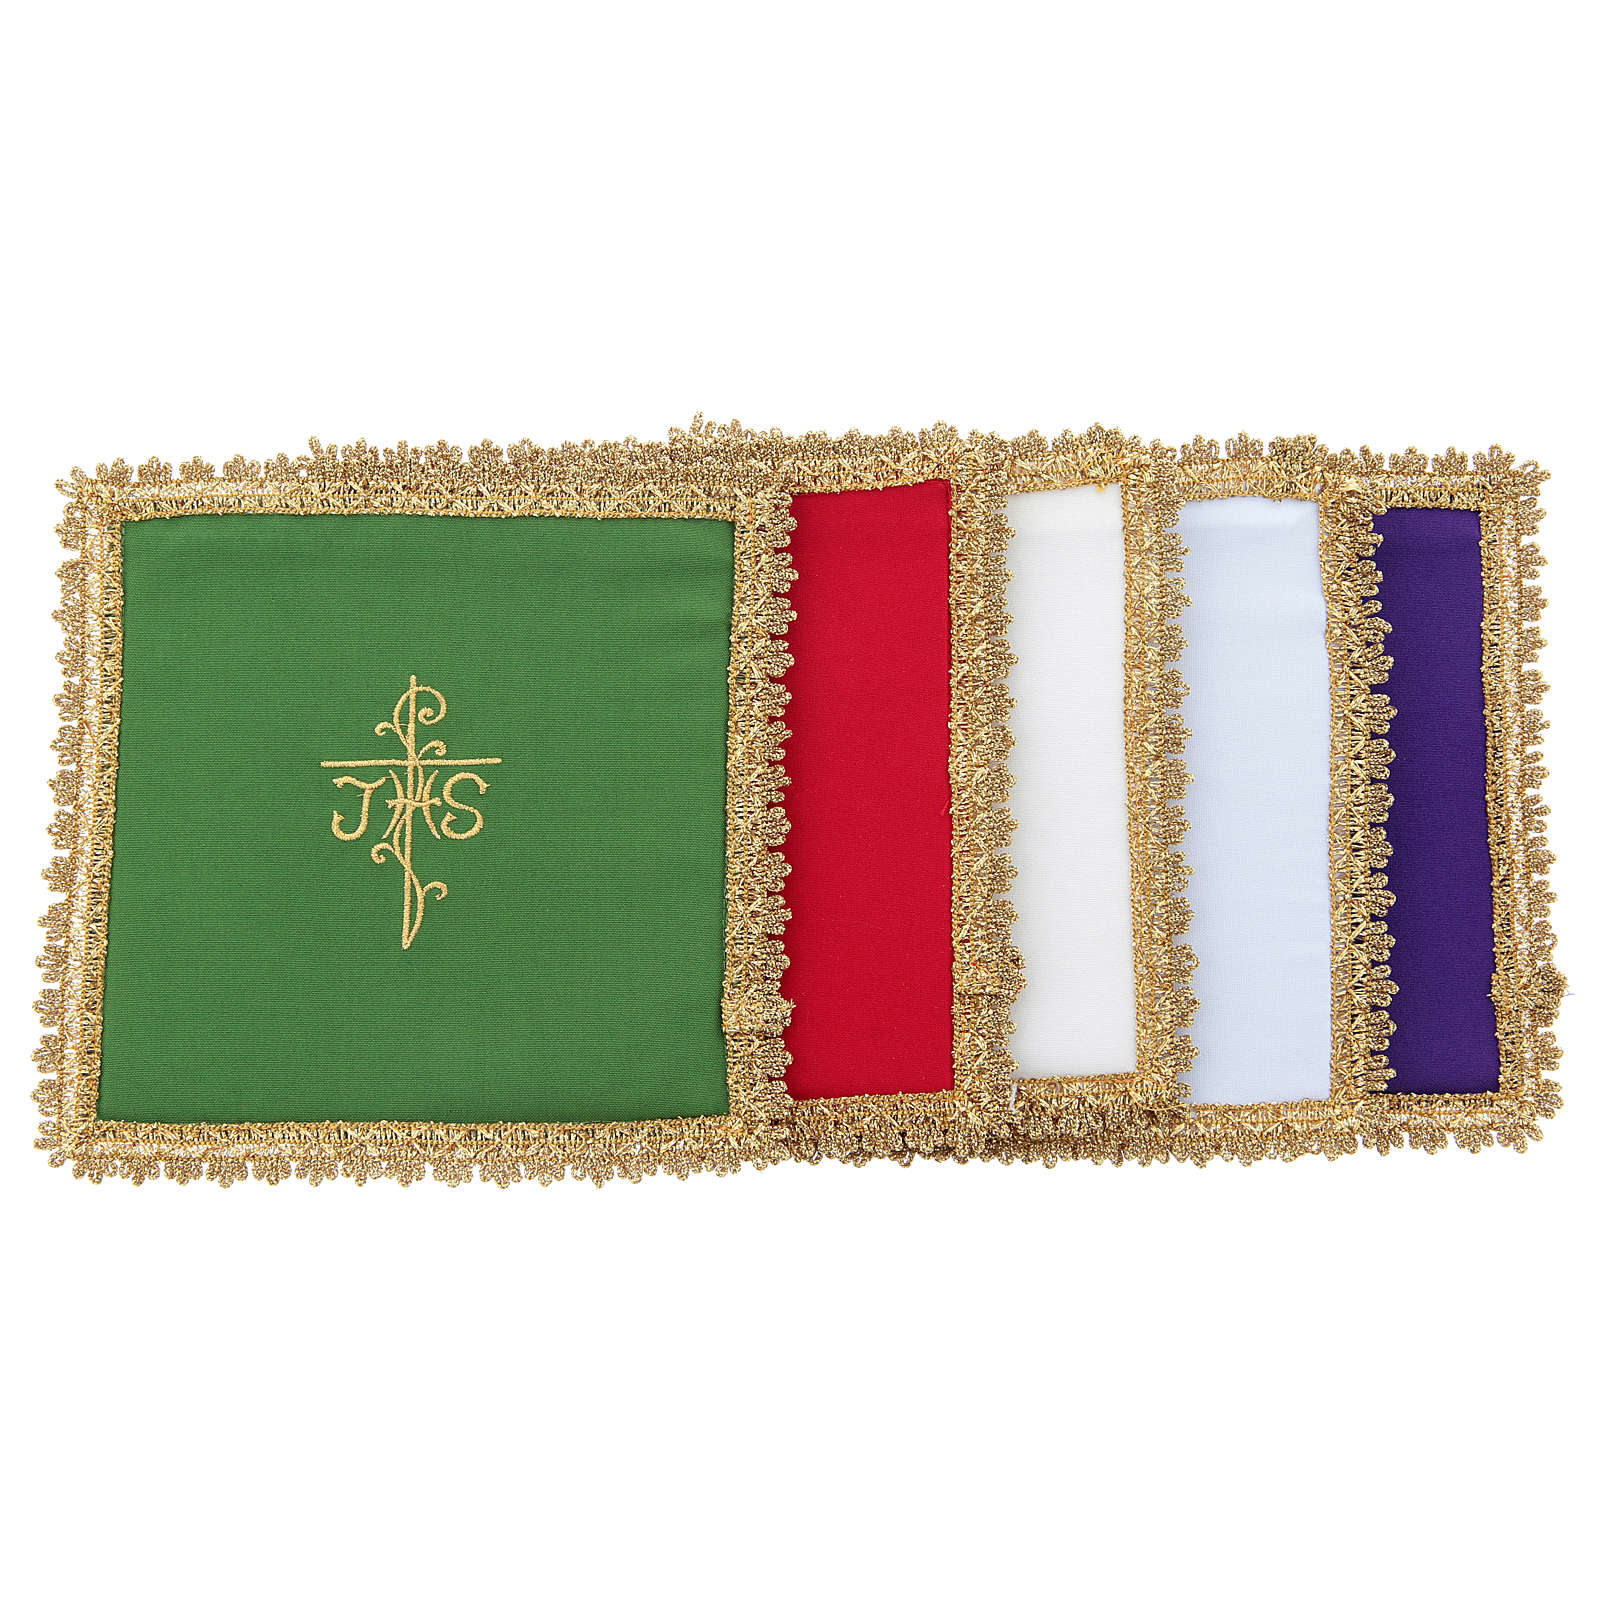 Palia Vatican poliéster cartoncillo extraíble 4